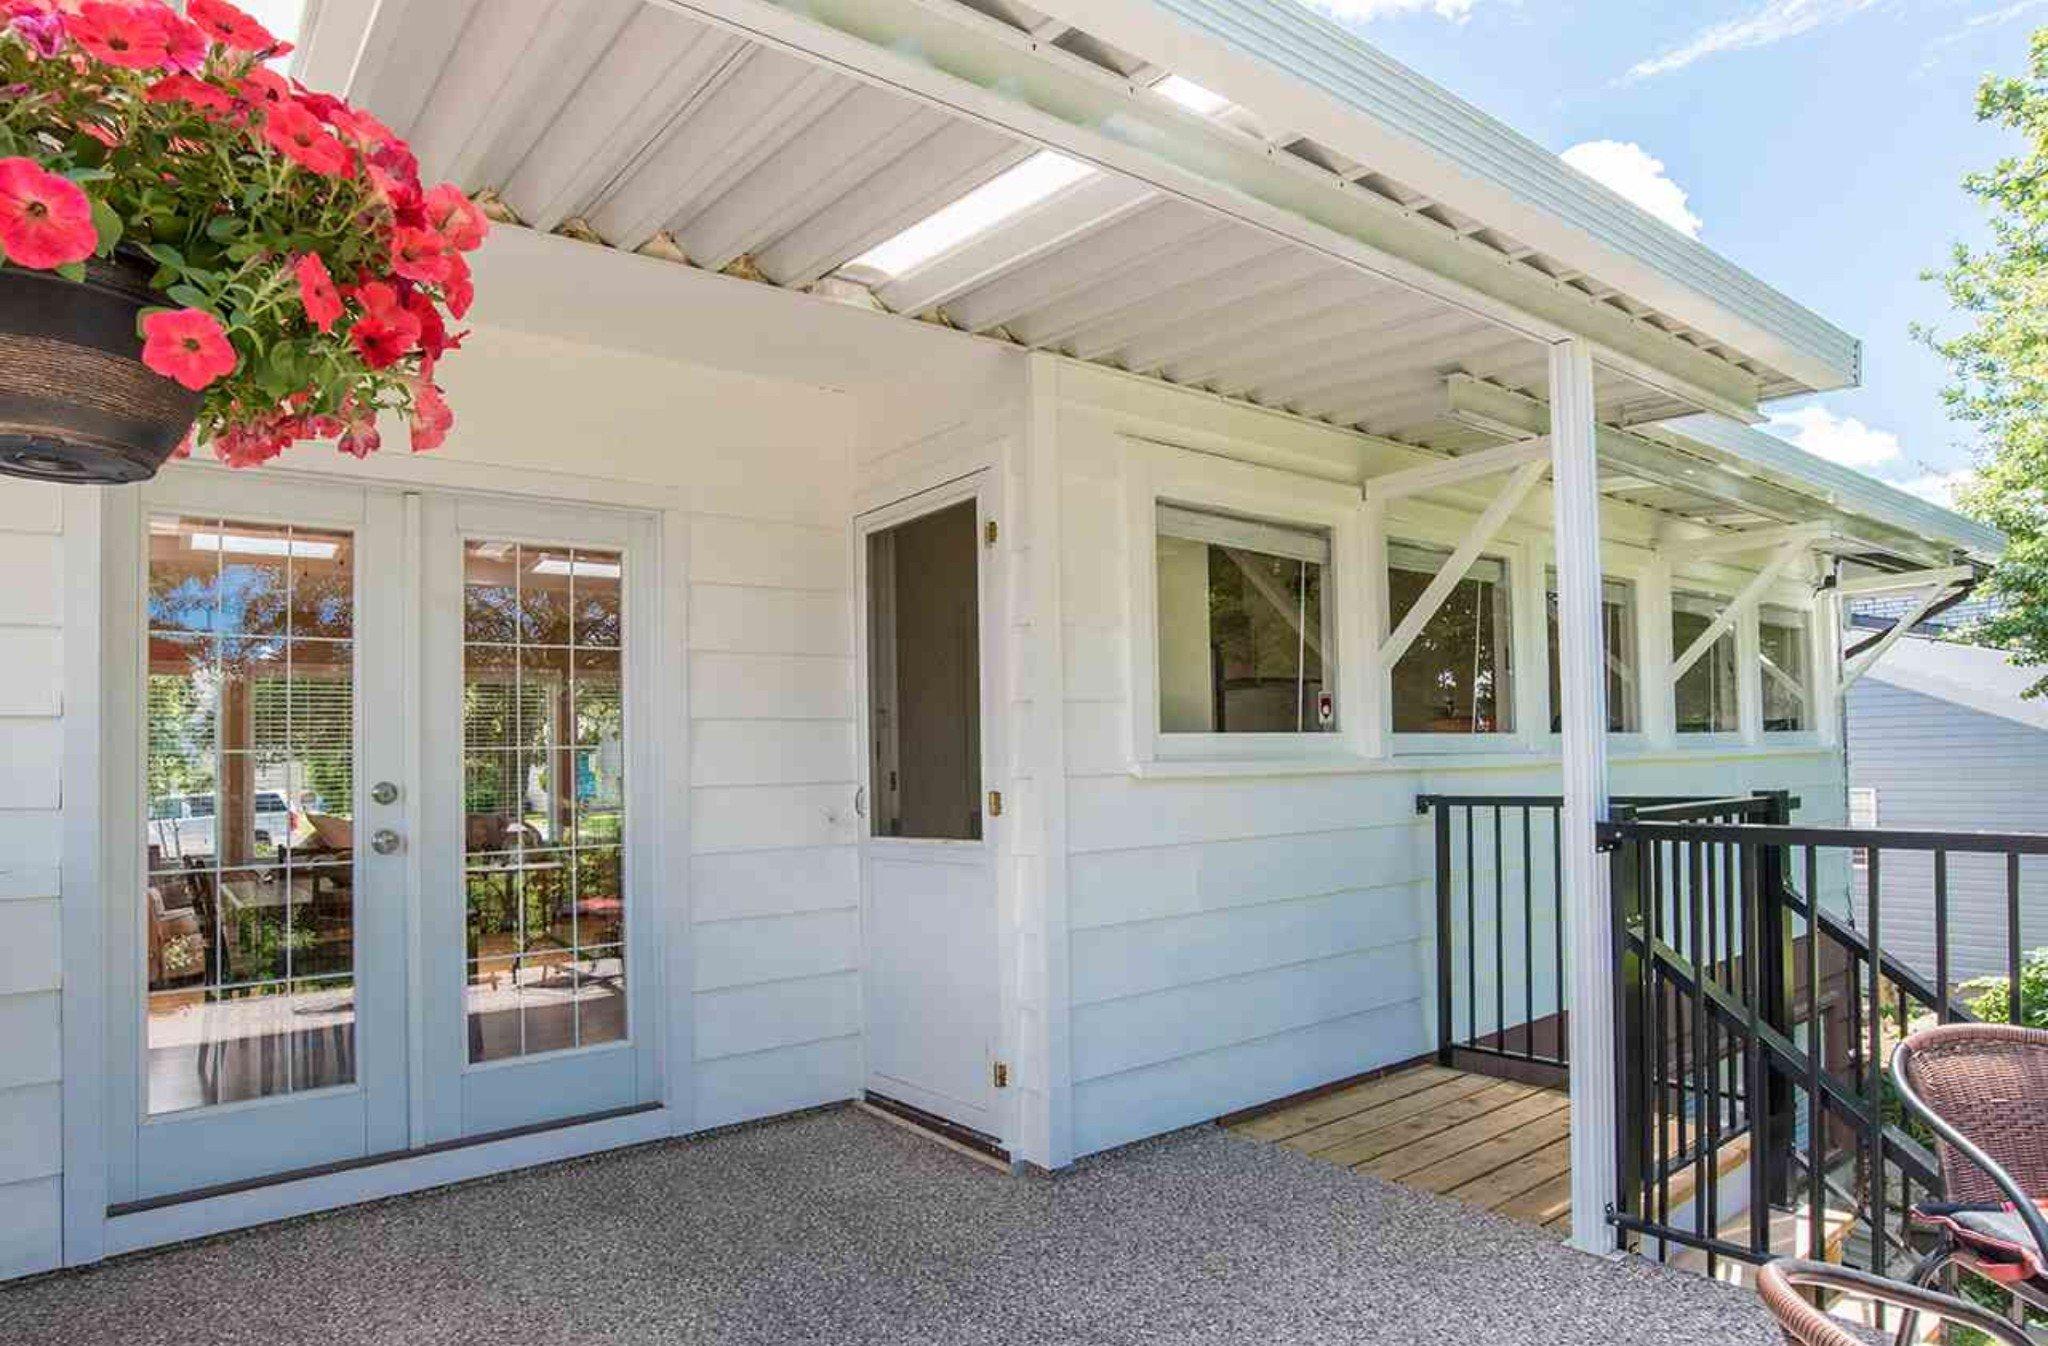 Photo 13: Photos: 10327 127A Street in Surrey: Cedar Hills House for sale : MLS®# R2178137